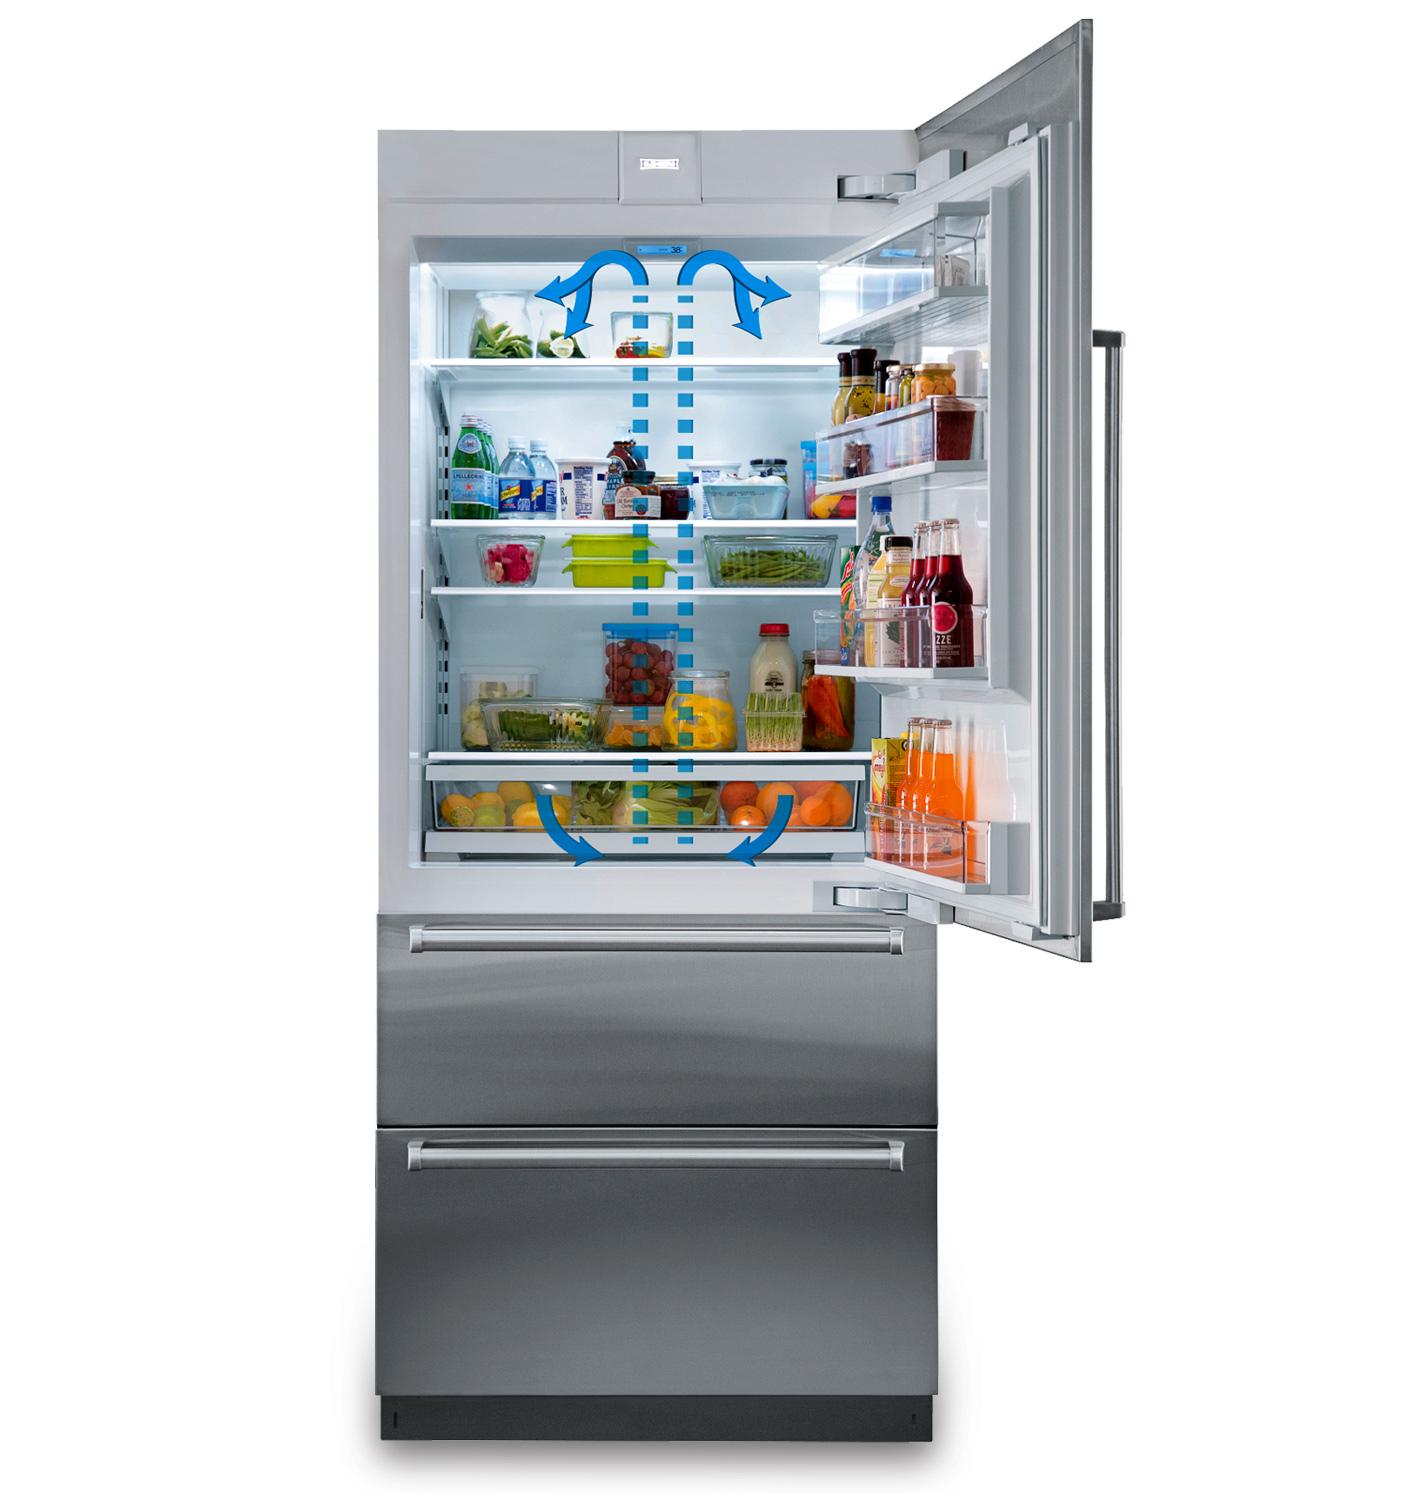 Sub-Zero appliance